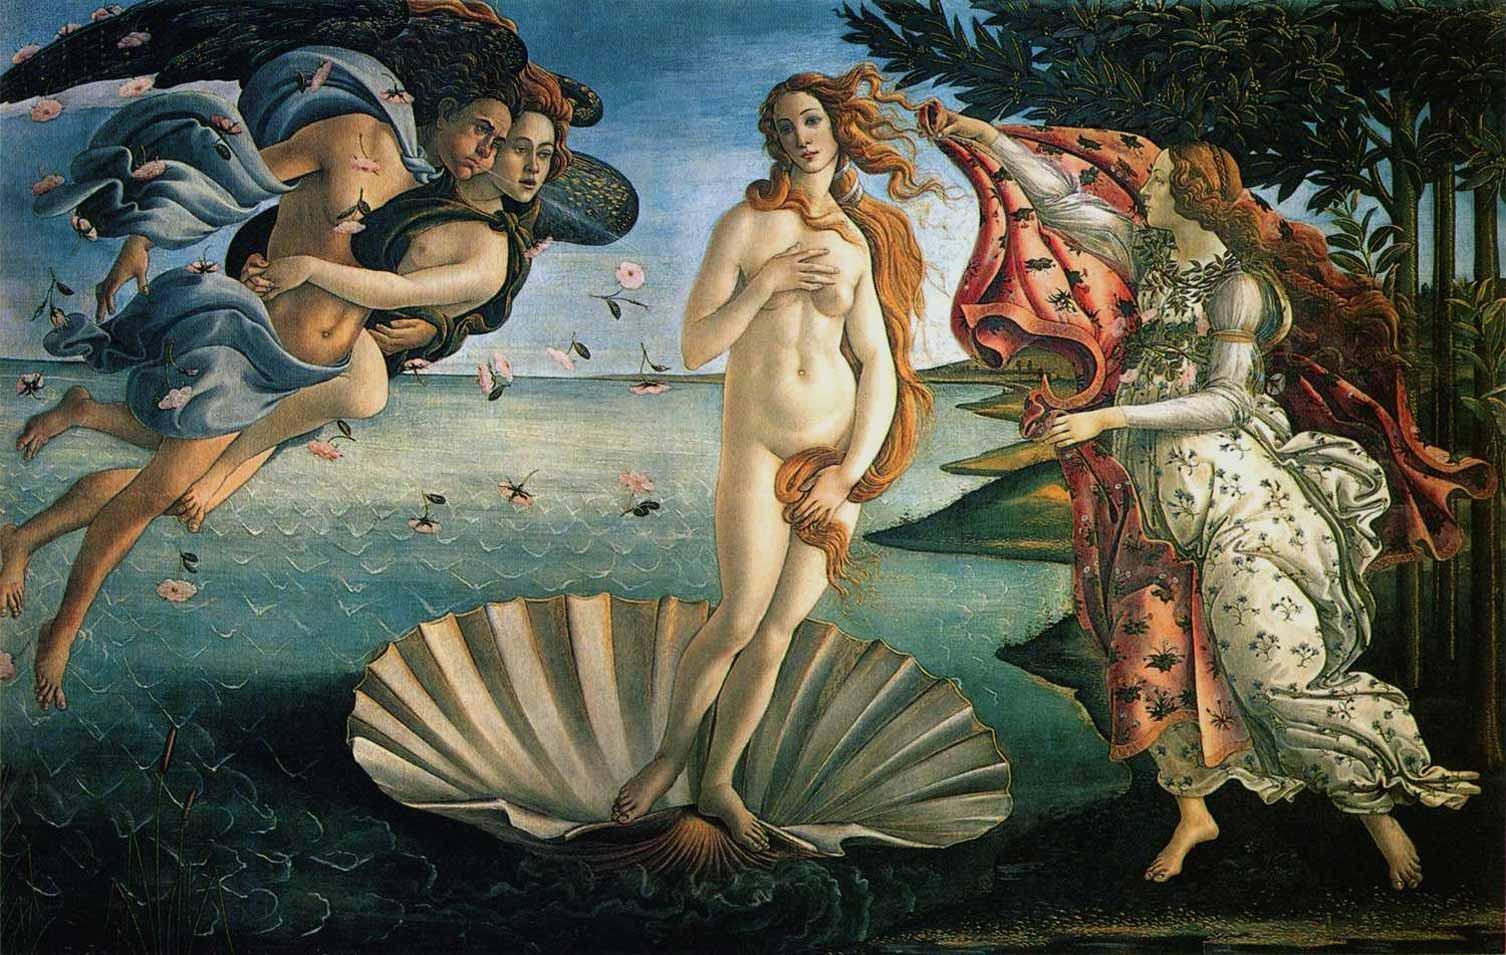 Sandro Botticelli The Birth of Venus painting | framed ...